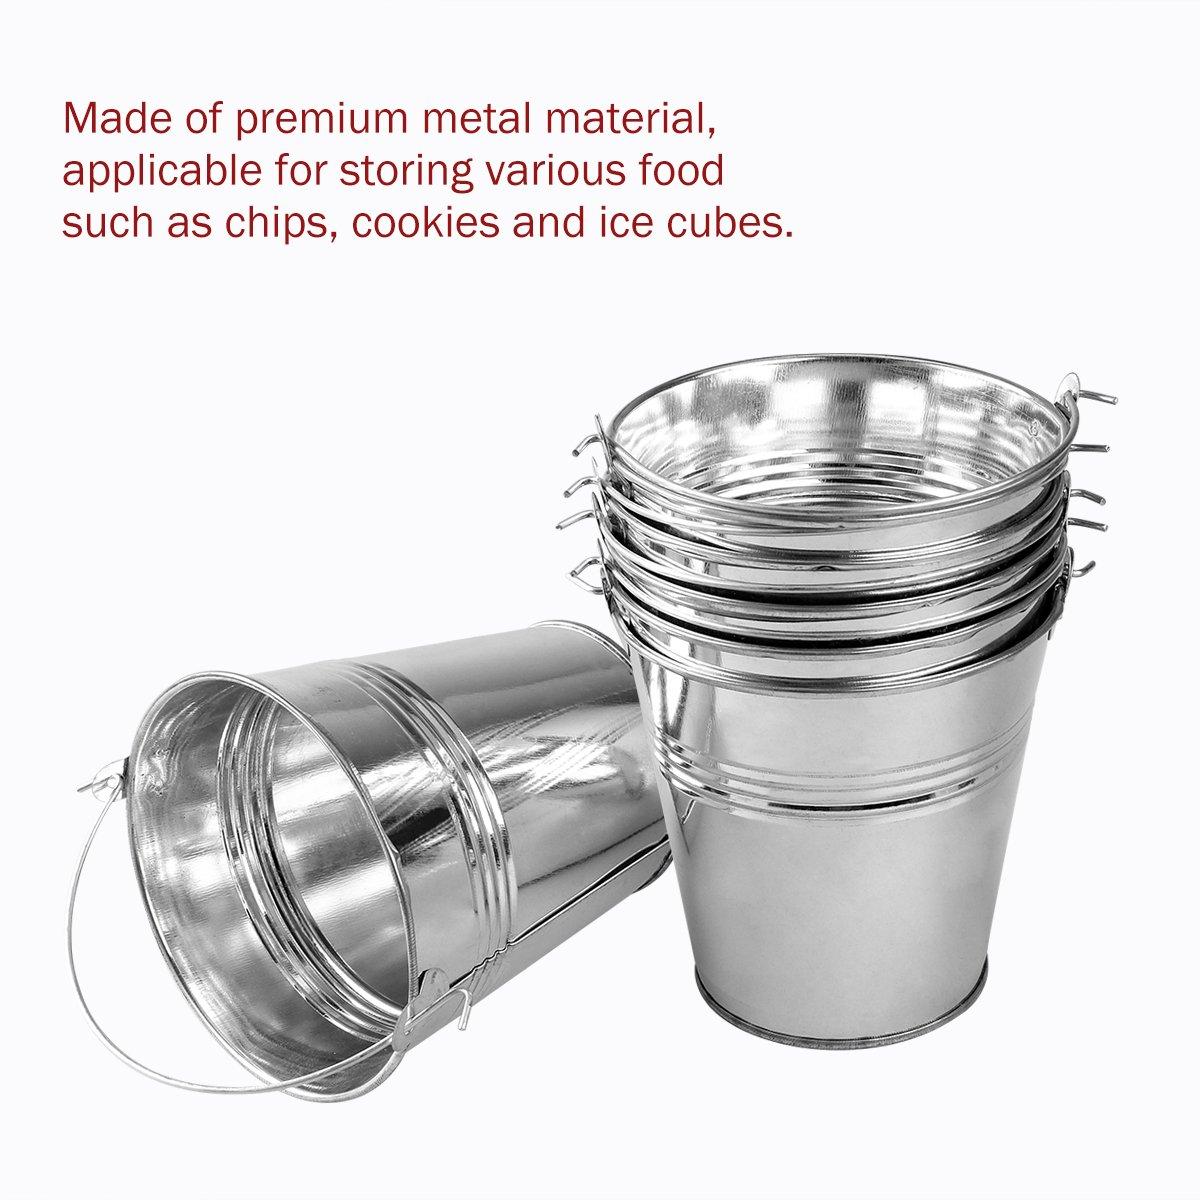 OUNONA Mini Metal Bucket Set of 6 /Mini Food Containers/Succulent Wedding Buckets 10.5x7.2x10.5cm by OUNONA (Image #3)